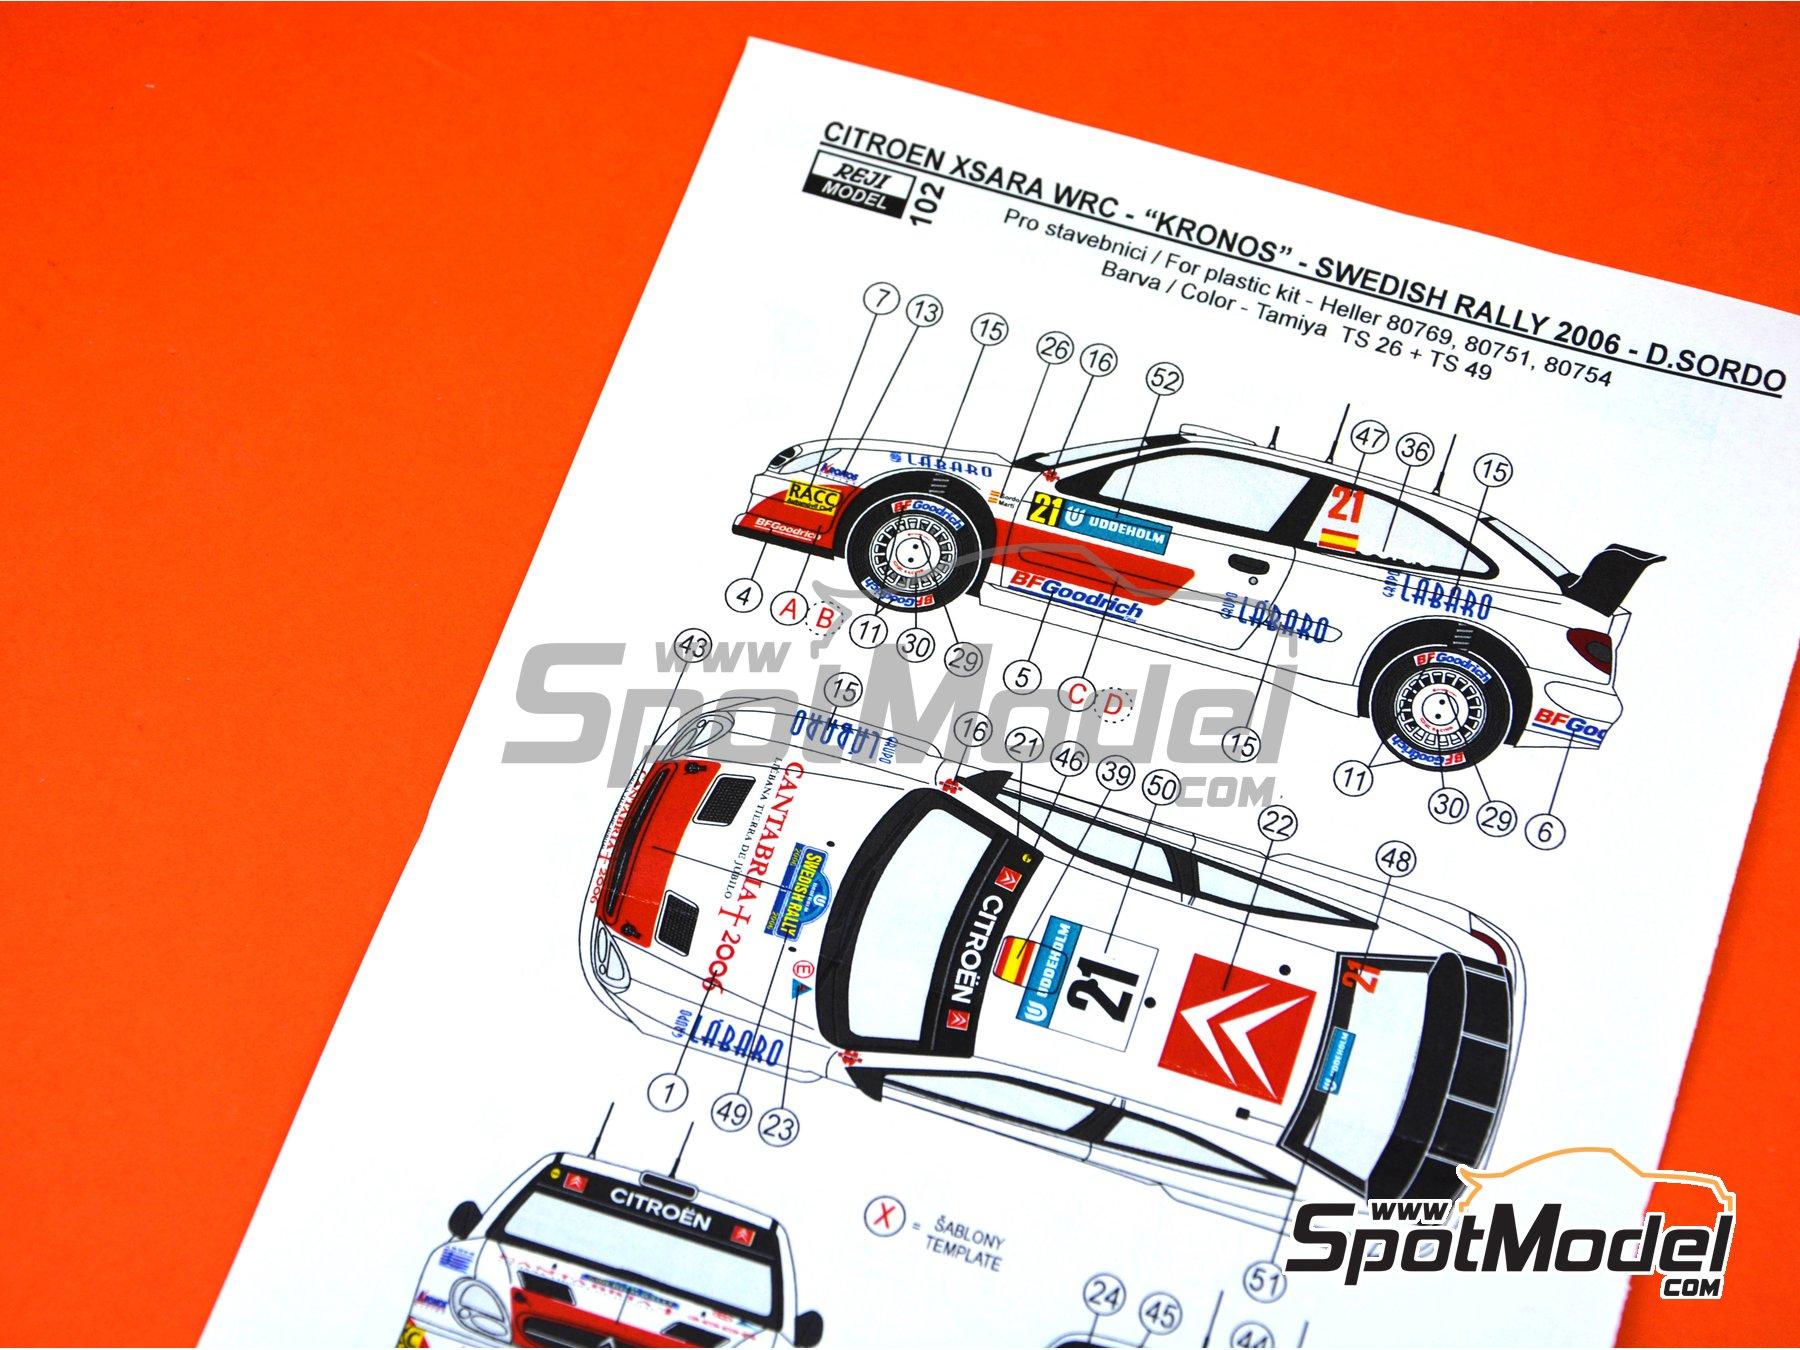 Image 5: Citroen Xsara WRC Kronos - Montecarlo Rally, Svezia Sweden Rally 2006 | Marking / livery in 1/24 scale manufactured by Reji Model (ref.REJI-102)